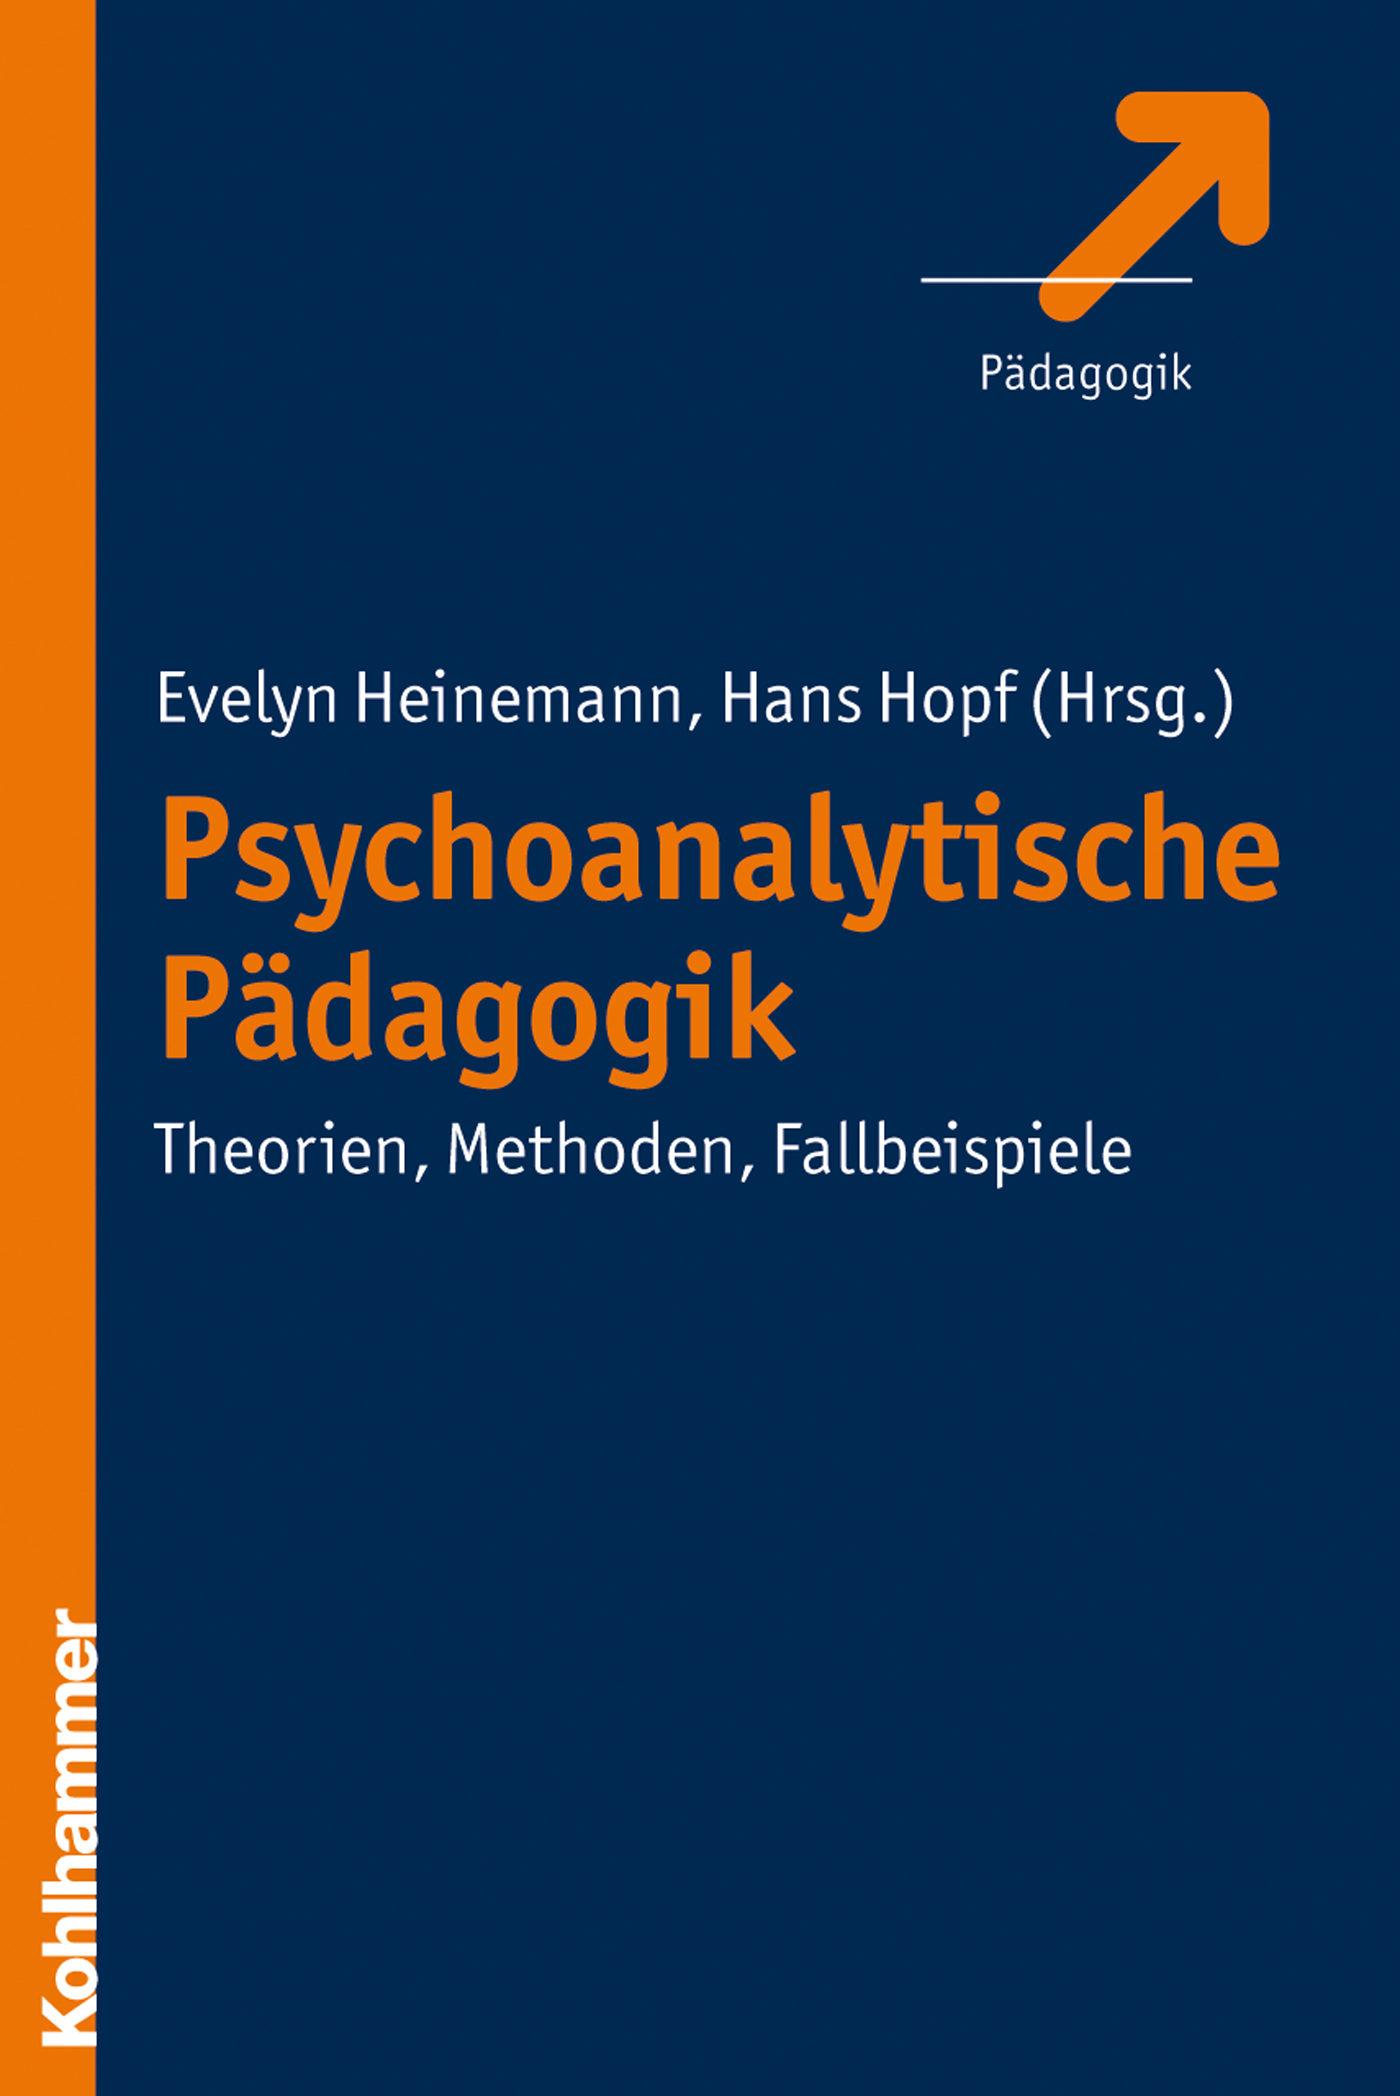 psychoanalytische pädagogik (ebook)-9783170277885